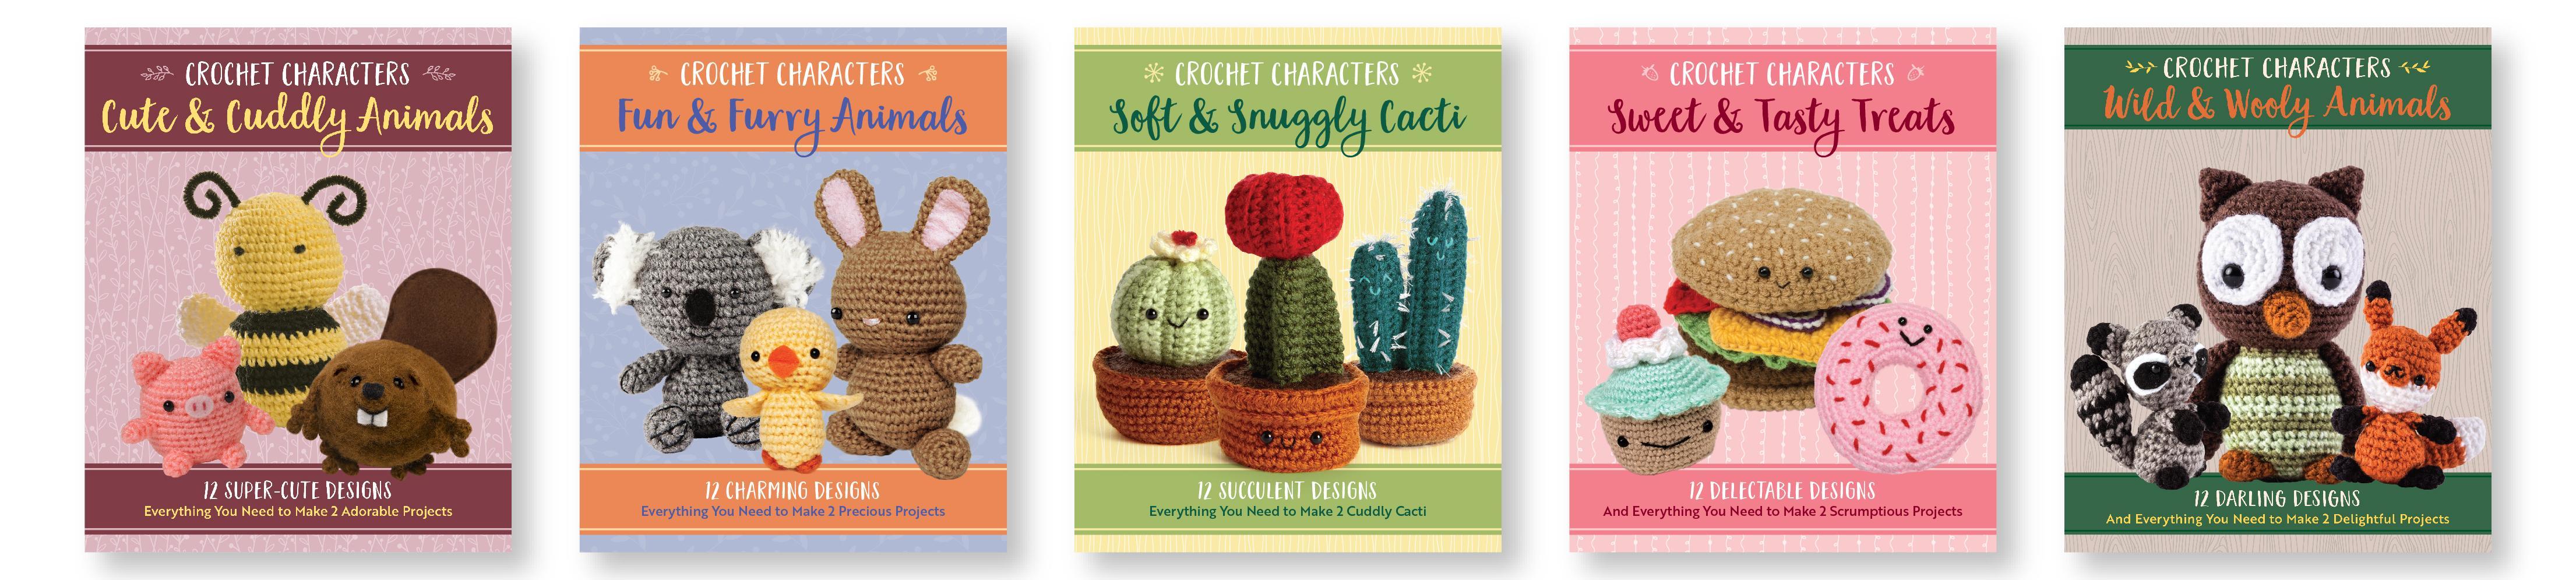 10 Free Crochet Dog Amigurumi Patterns - Amigurumi | 995x4421